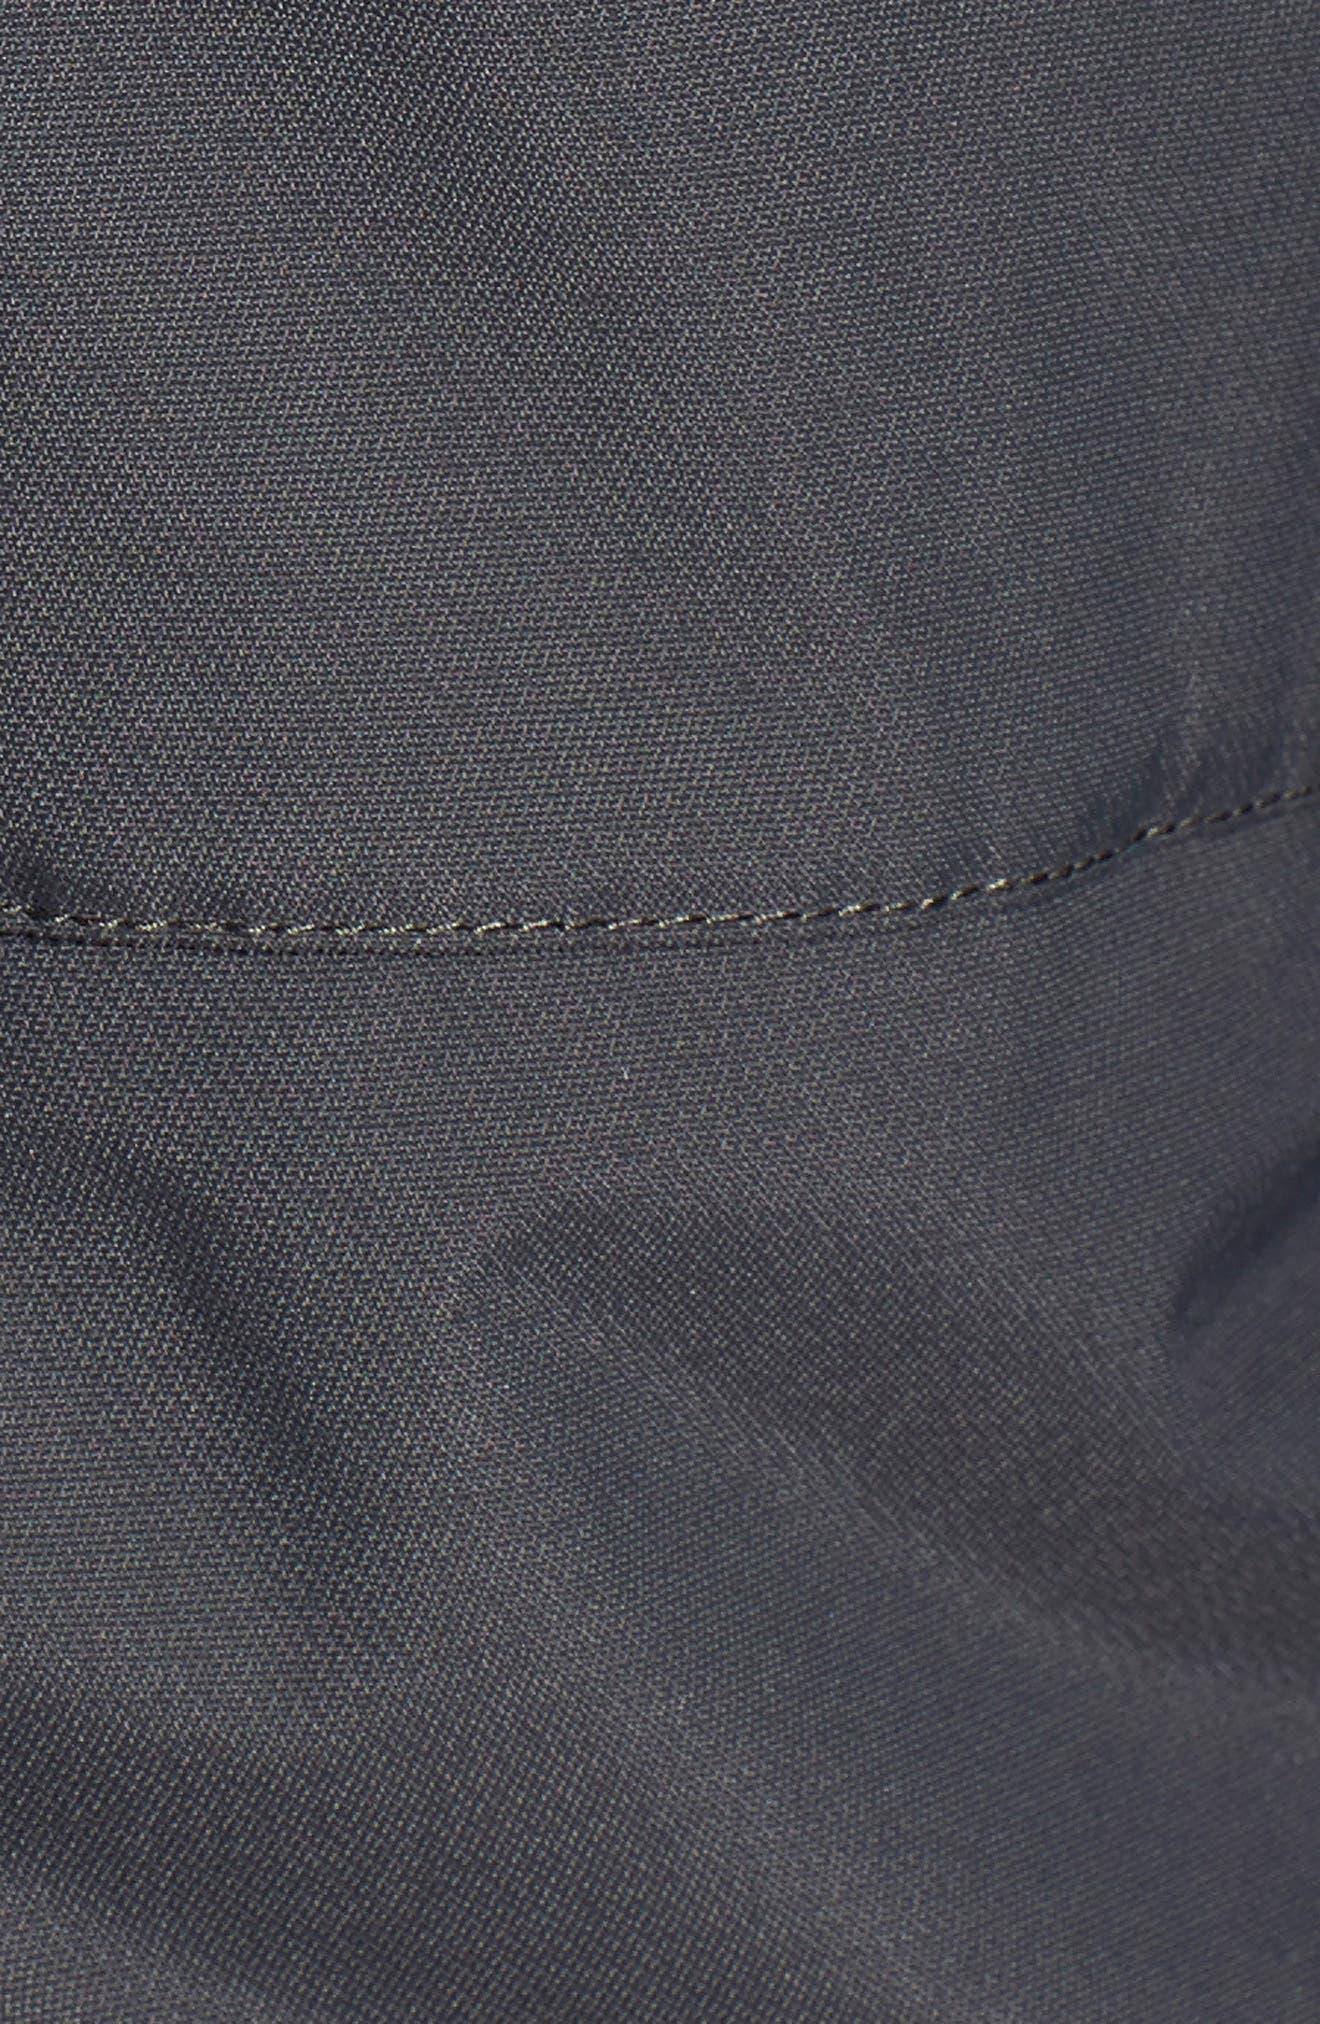 HellyHansen 'Universal' MotoRain Jacket,                             Alternate thumbnail 5, color,                             080